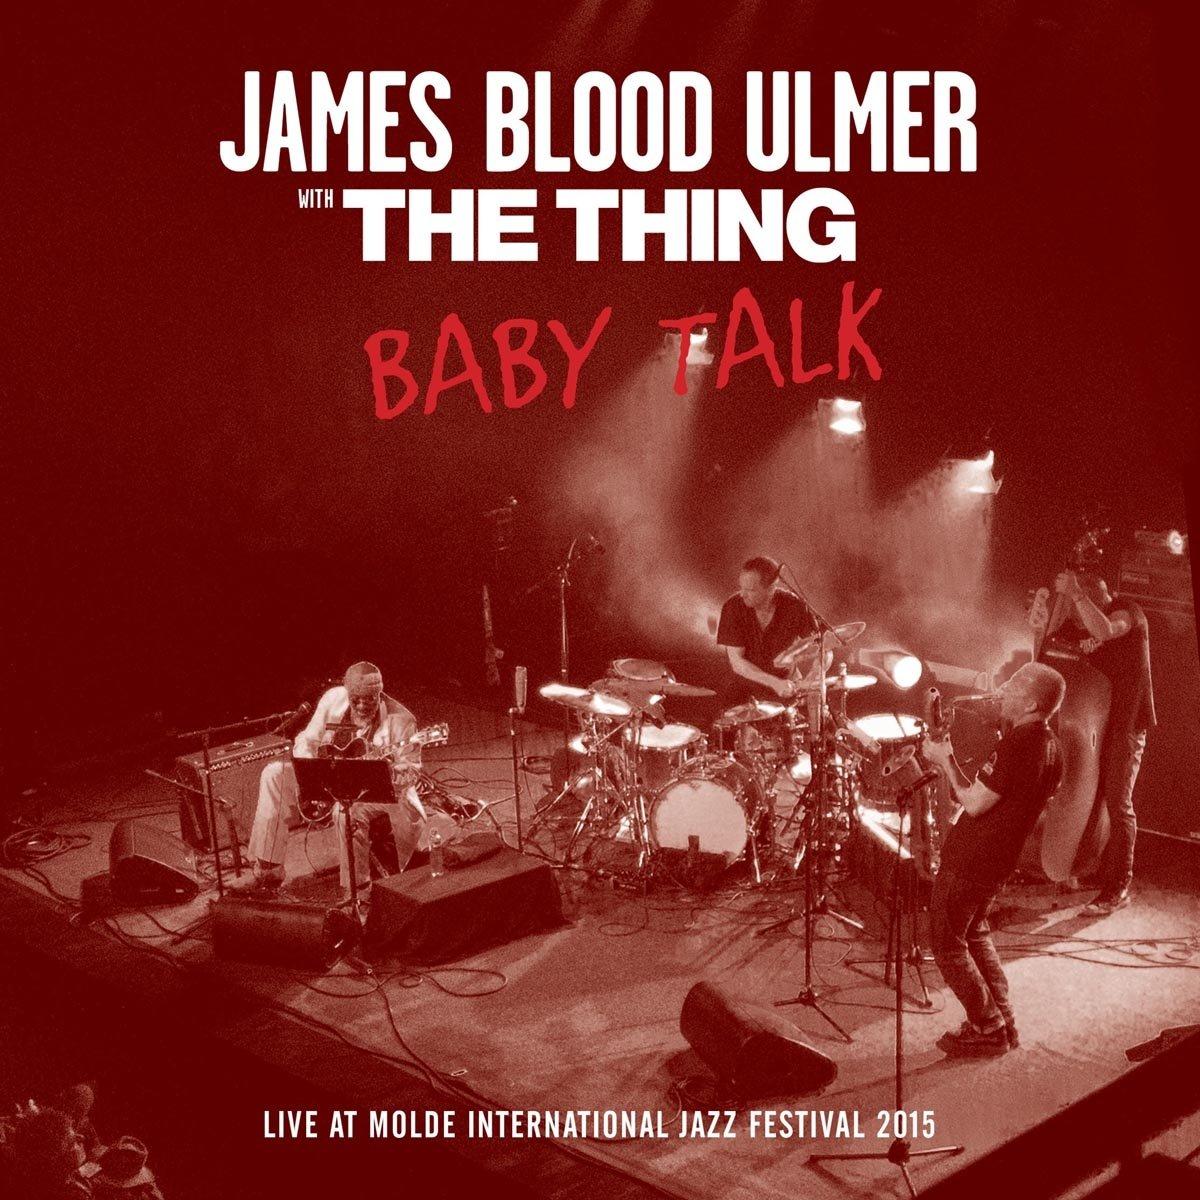 THING & JAMES BLOOD ULMER - Baby Talk (LP Vinyl)